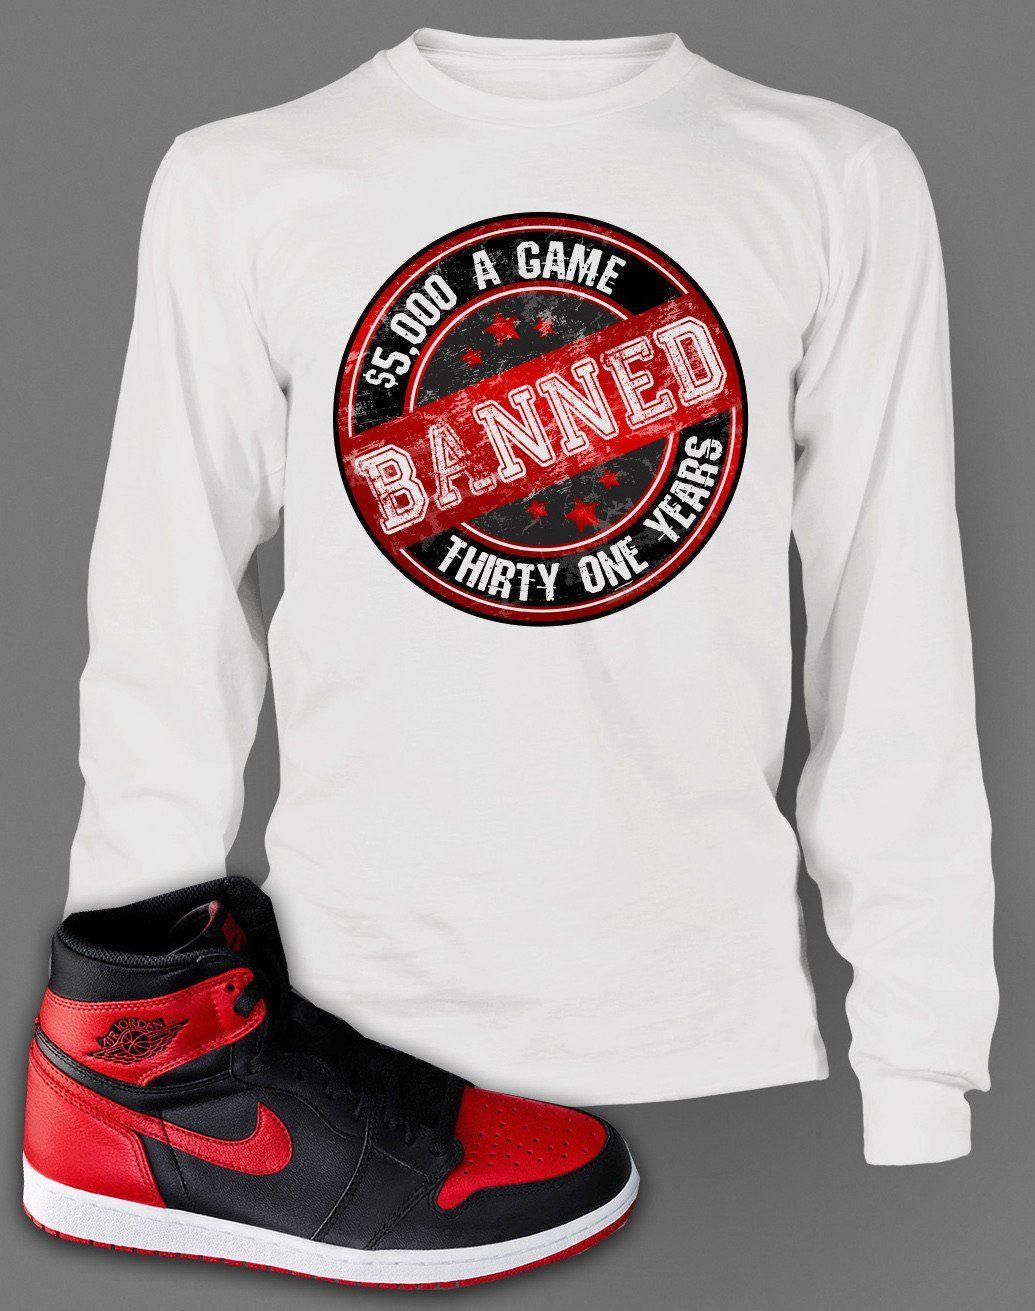 ceeba3b31c7 Long Sleeve Graphic T-Shirt To Match Retro Air Jordan 1 Banned Shoe ...